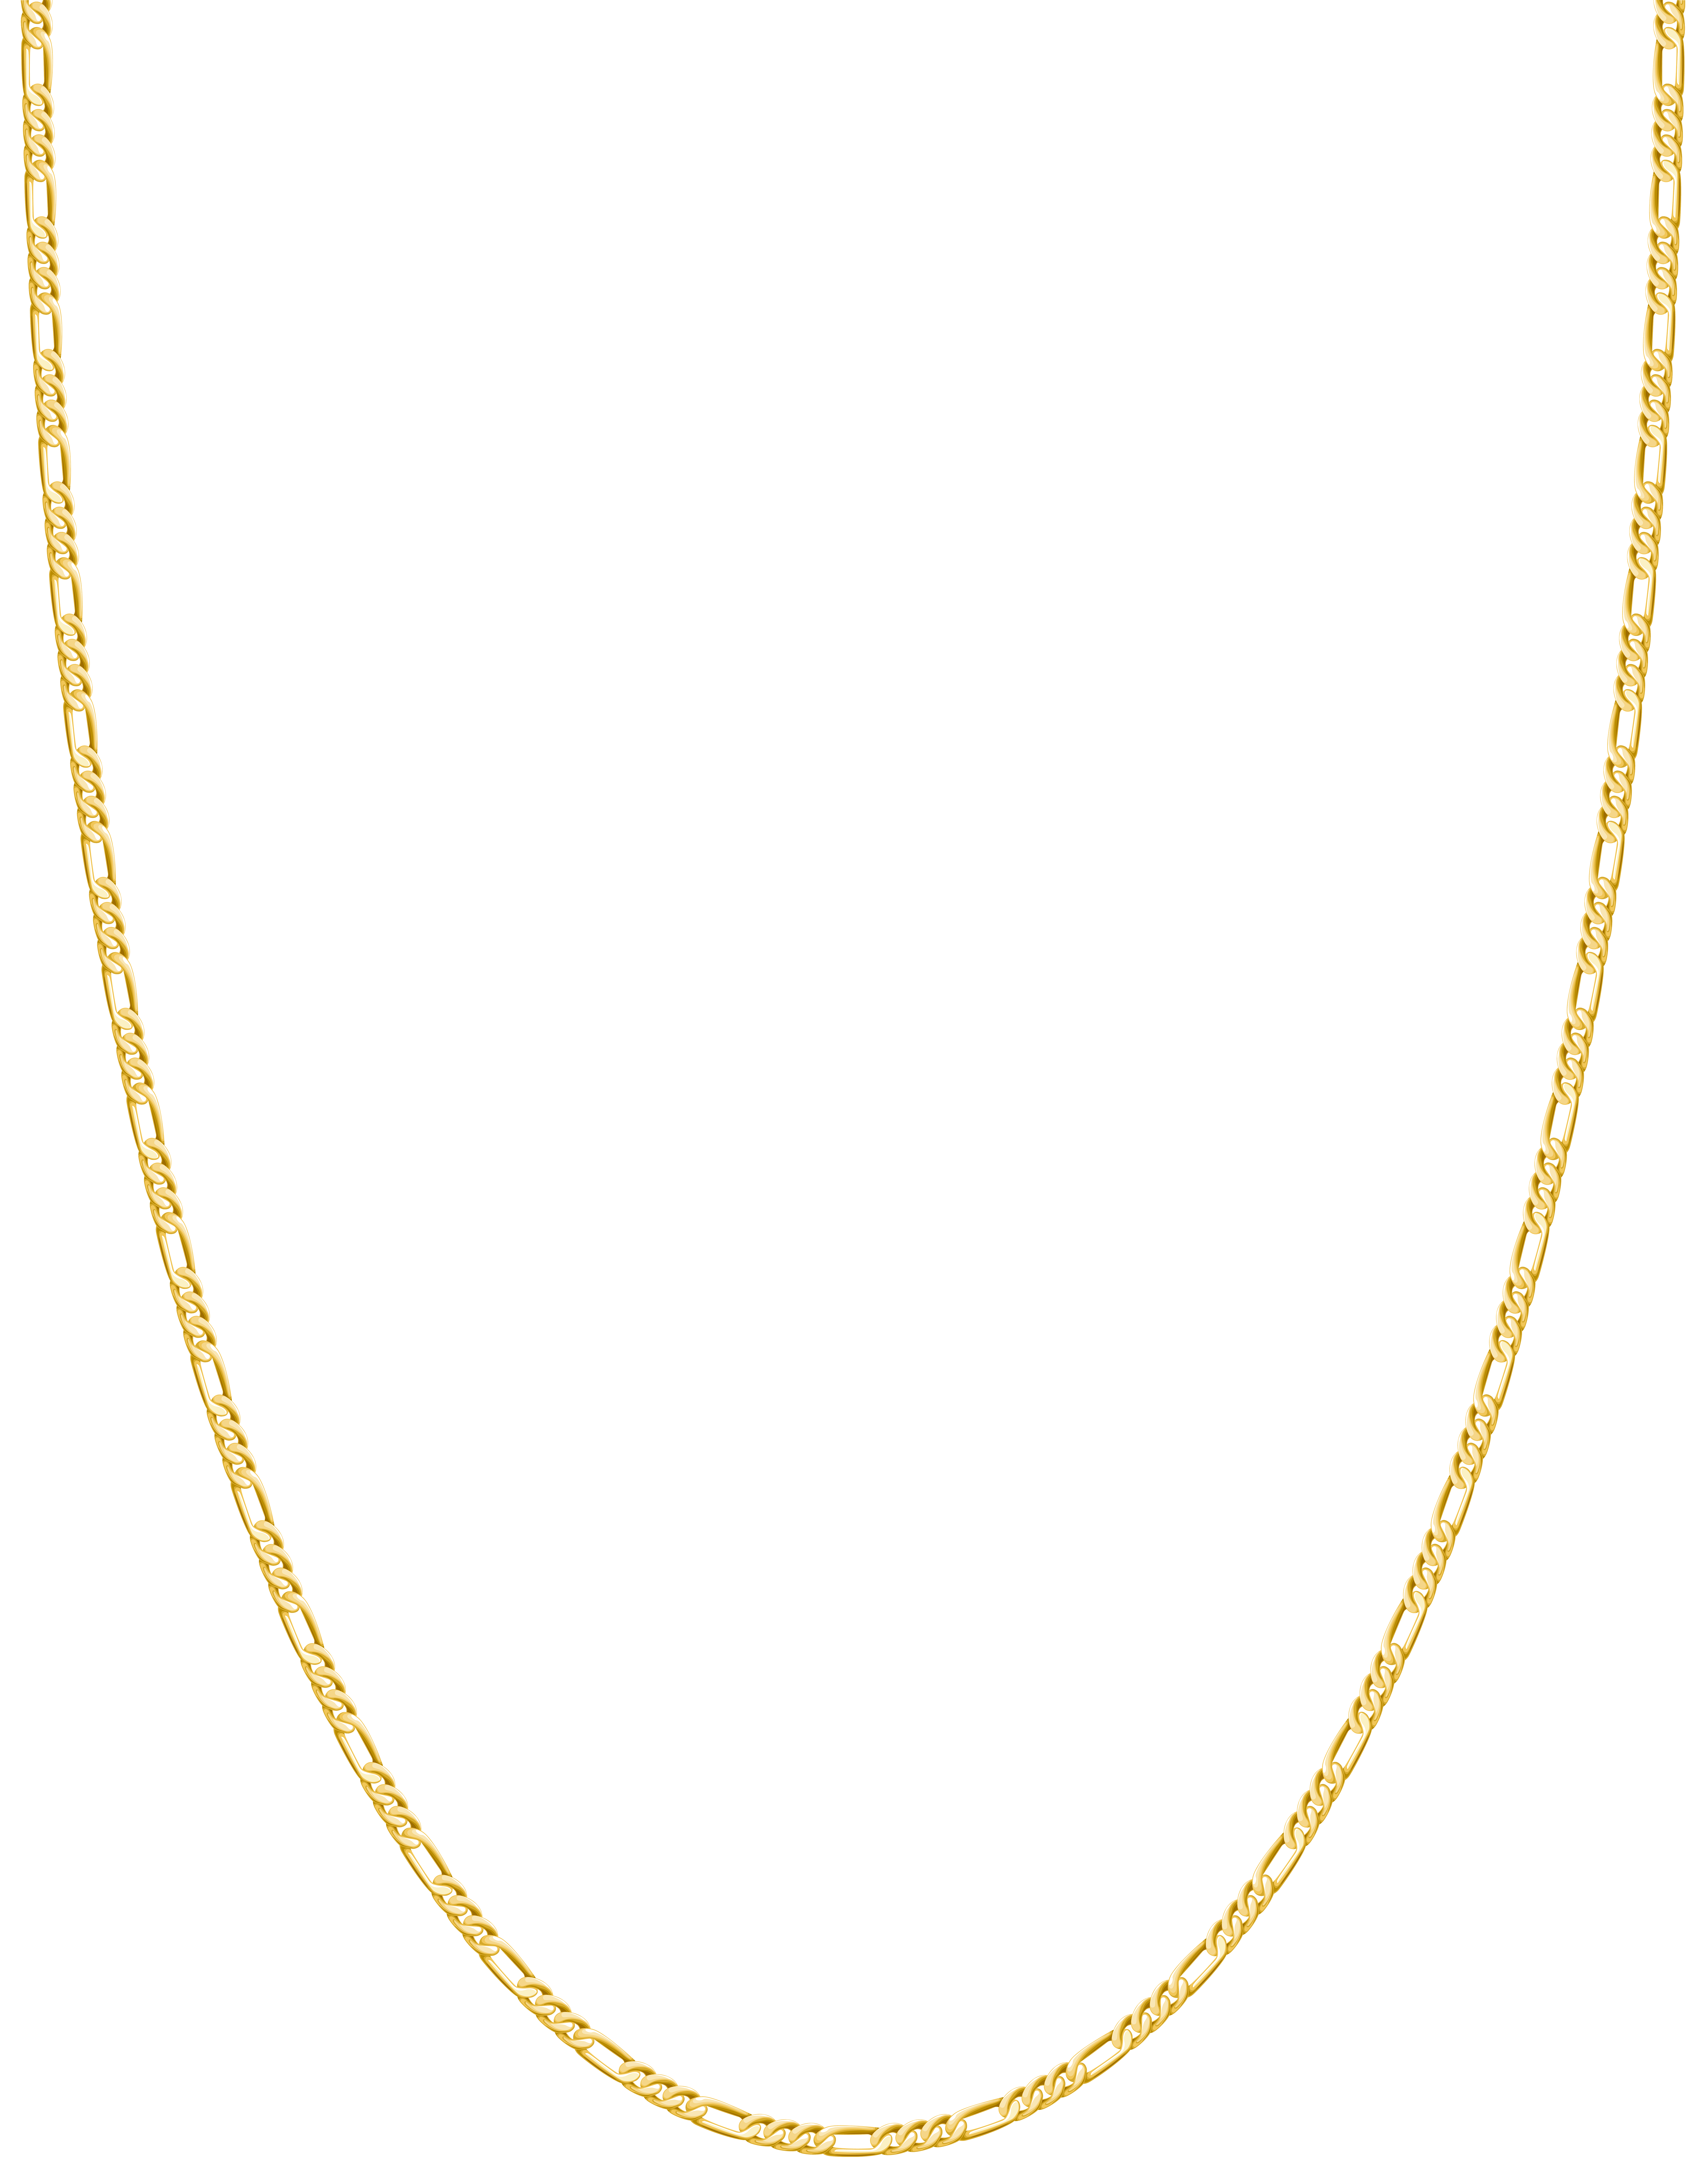 Chain clipart transparent background. Golden png clip art